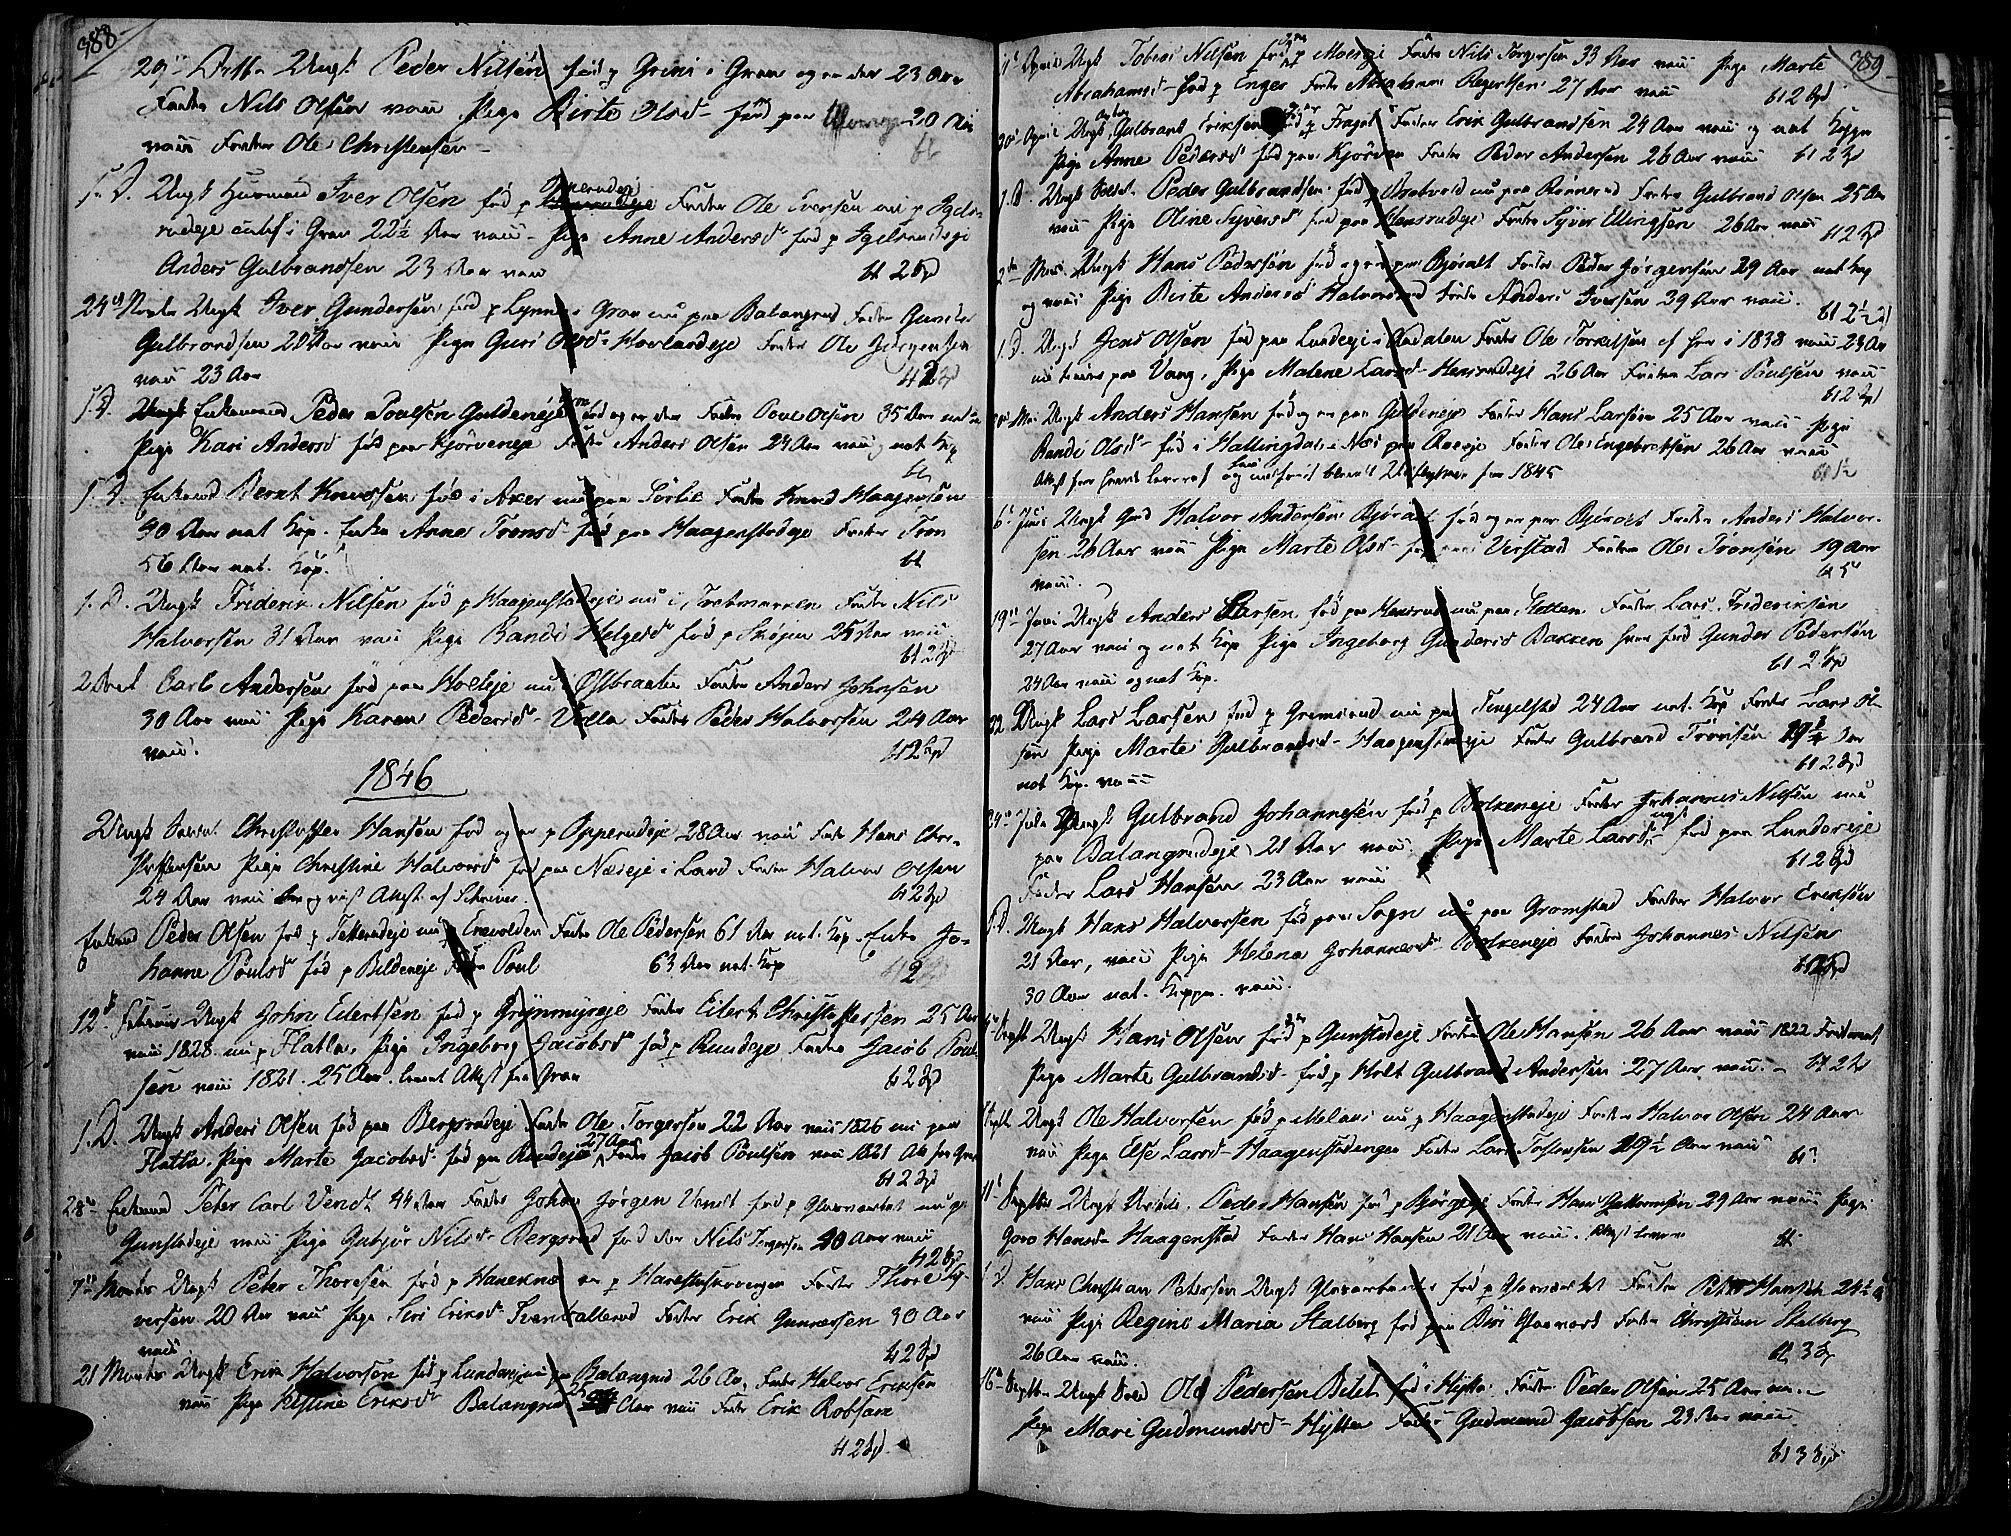 SAH, Jevnaker prestekontor, Ministerialbok nr. 4, 1800-1861, s. 388-389